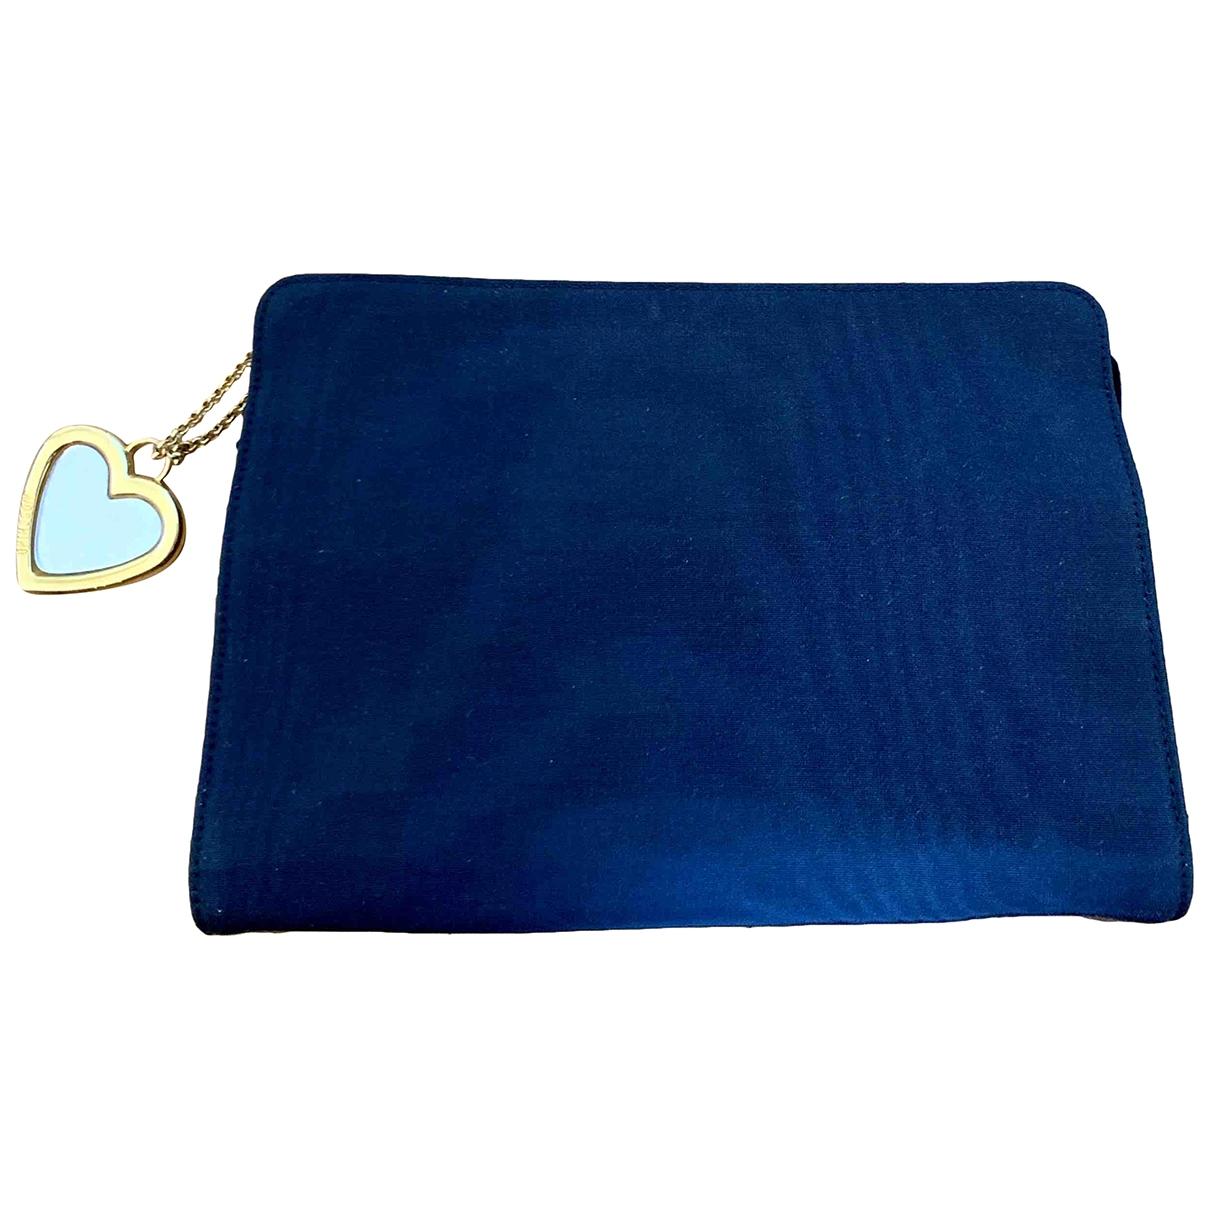 Moschino \N Blue Cloth Clutch bag for Women \N